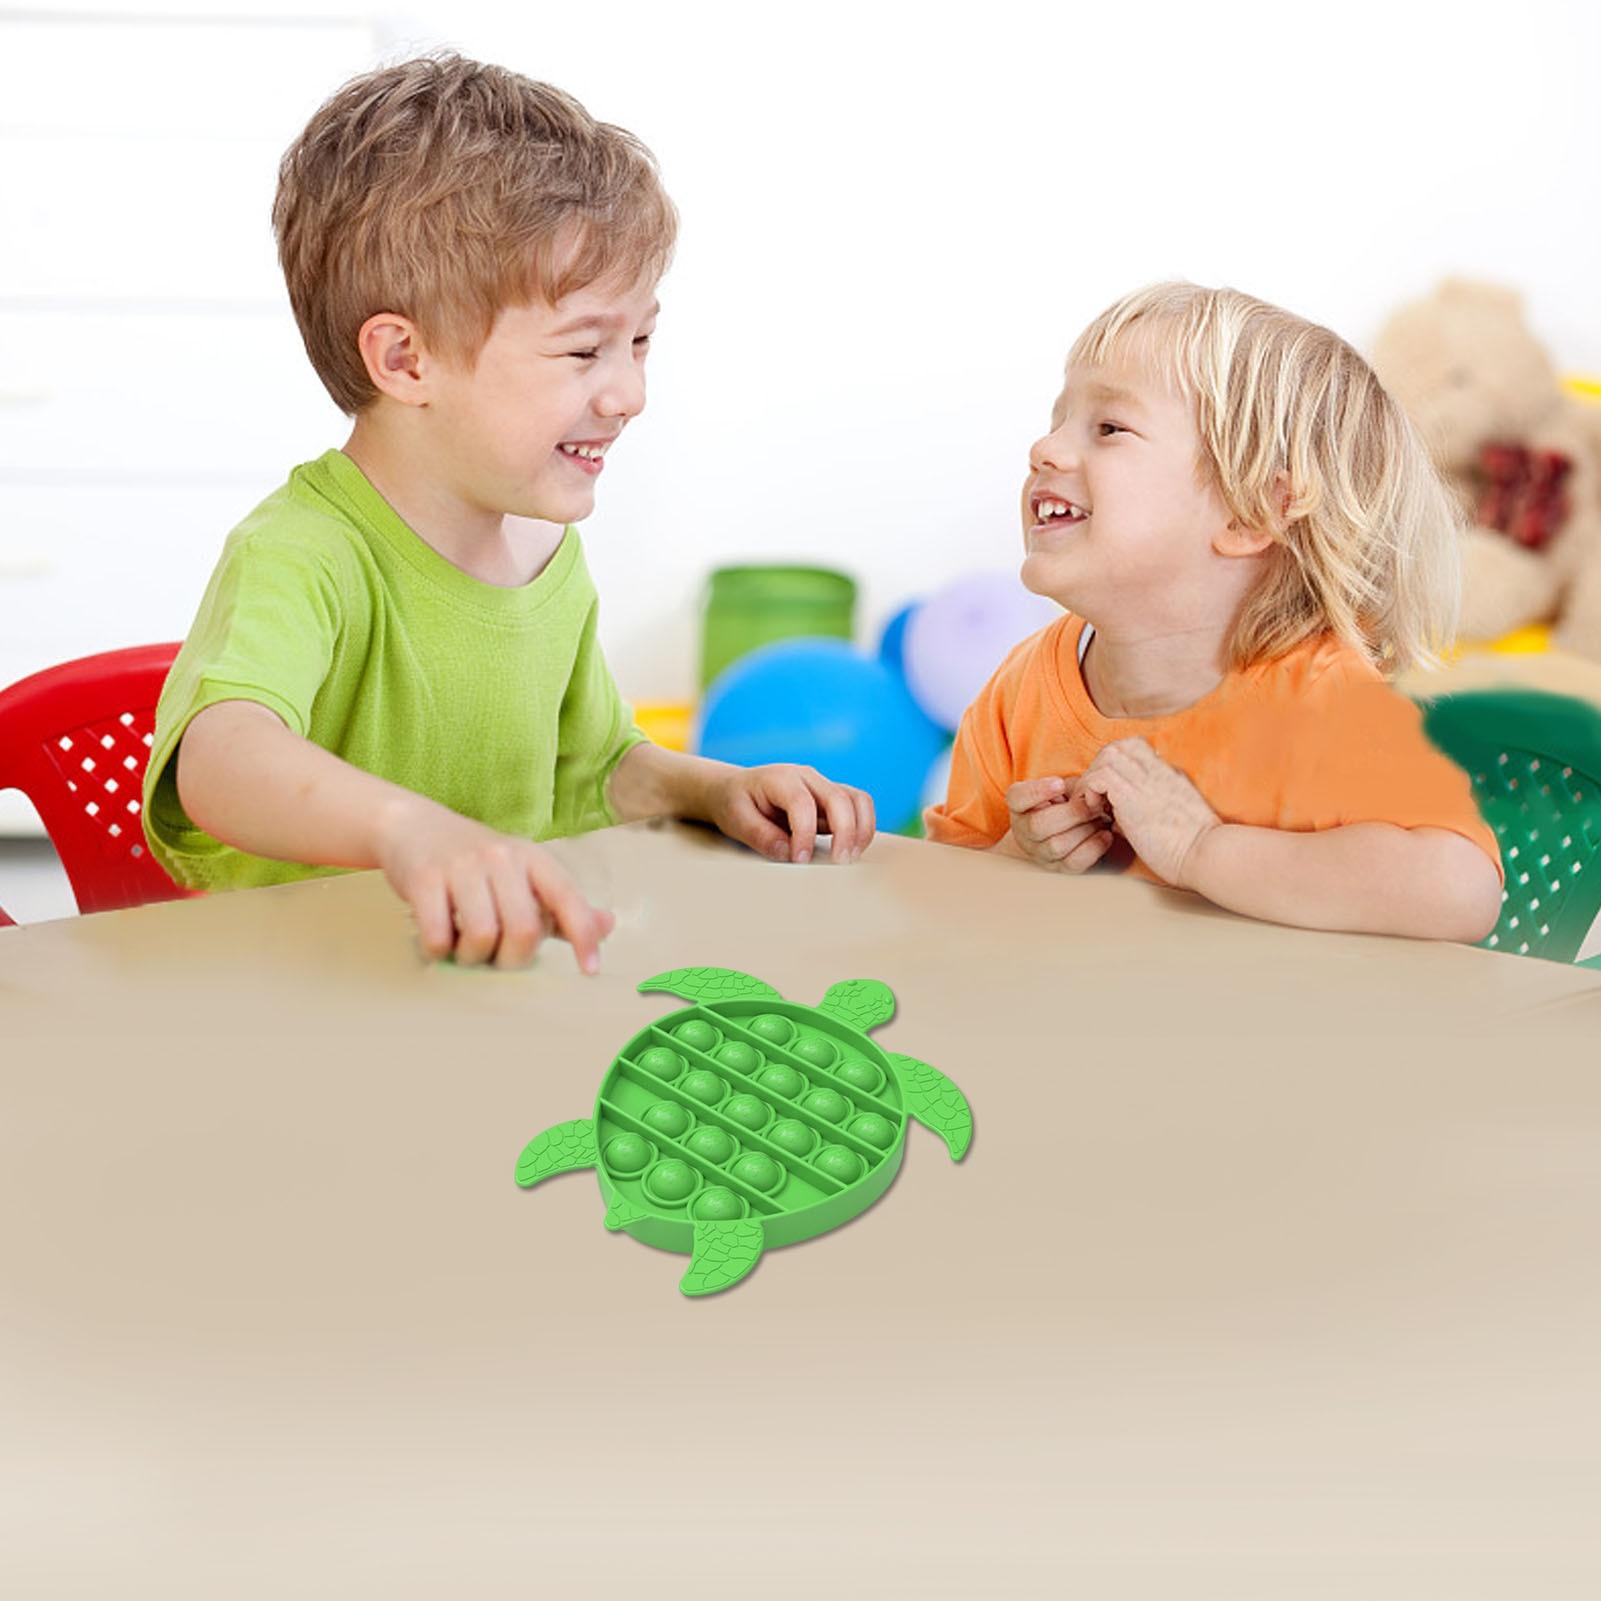 3 Pcs Stress Relief Toy Decompressive Bubbles Sensory Toys For Children Adults Office L50 enlarge